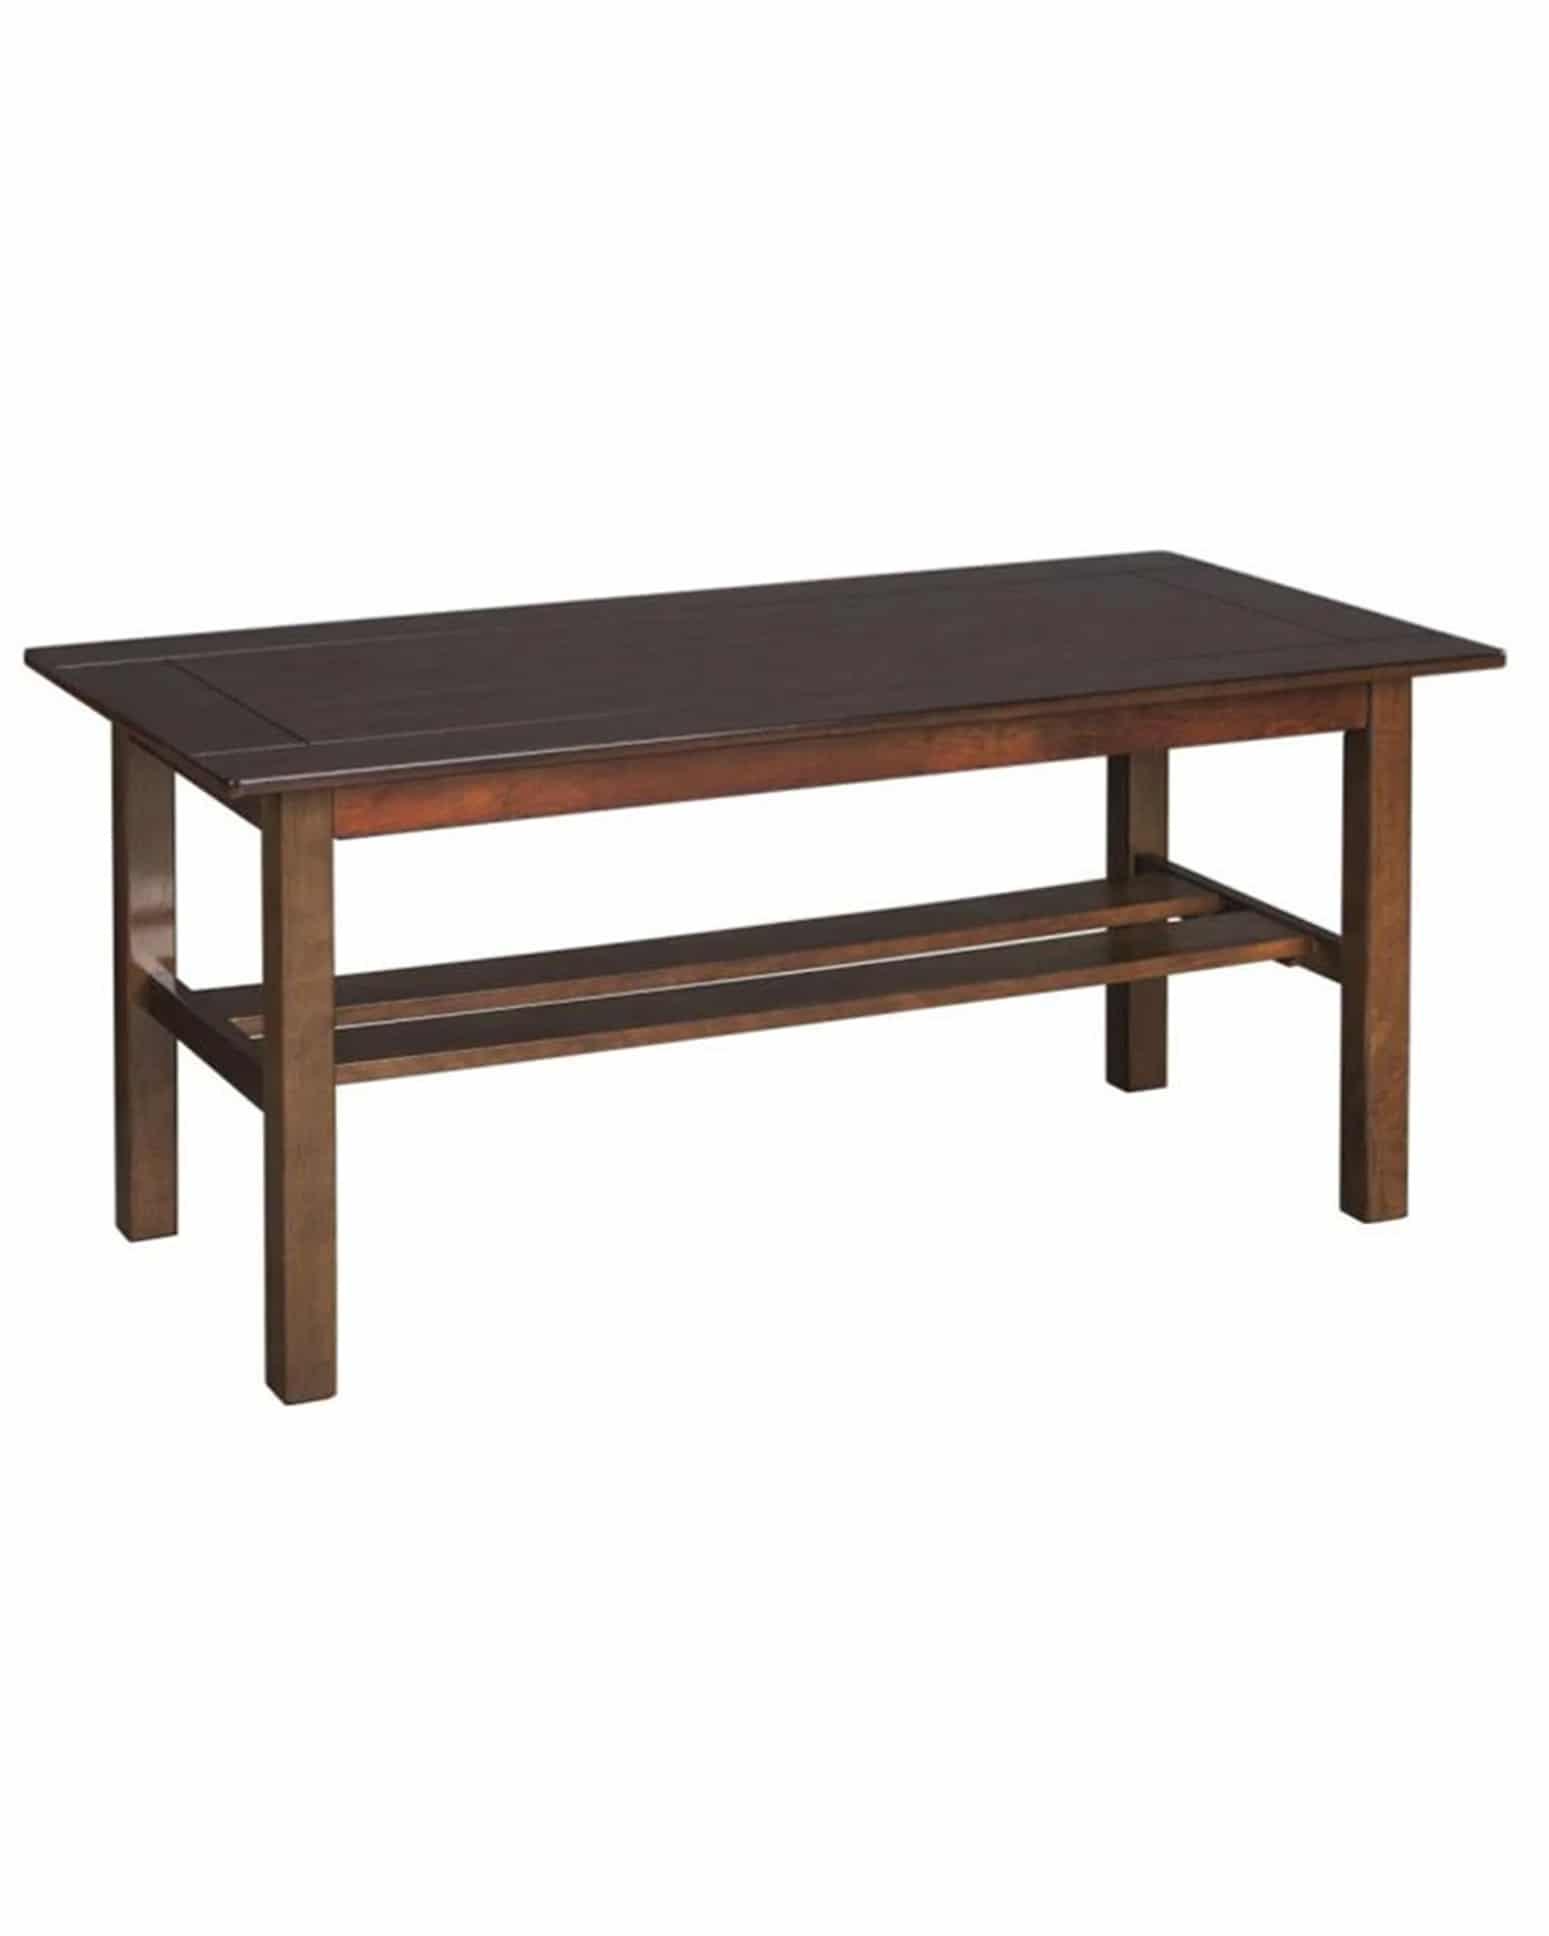 Wood-Rectangular-Coffee-Table